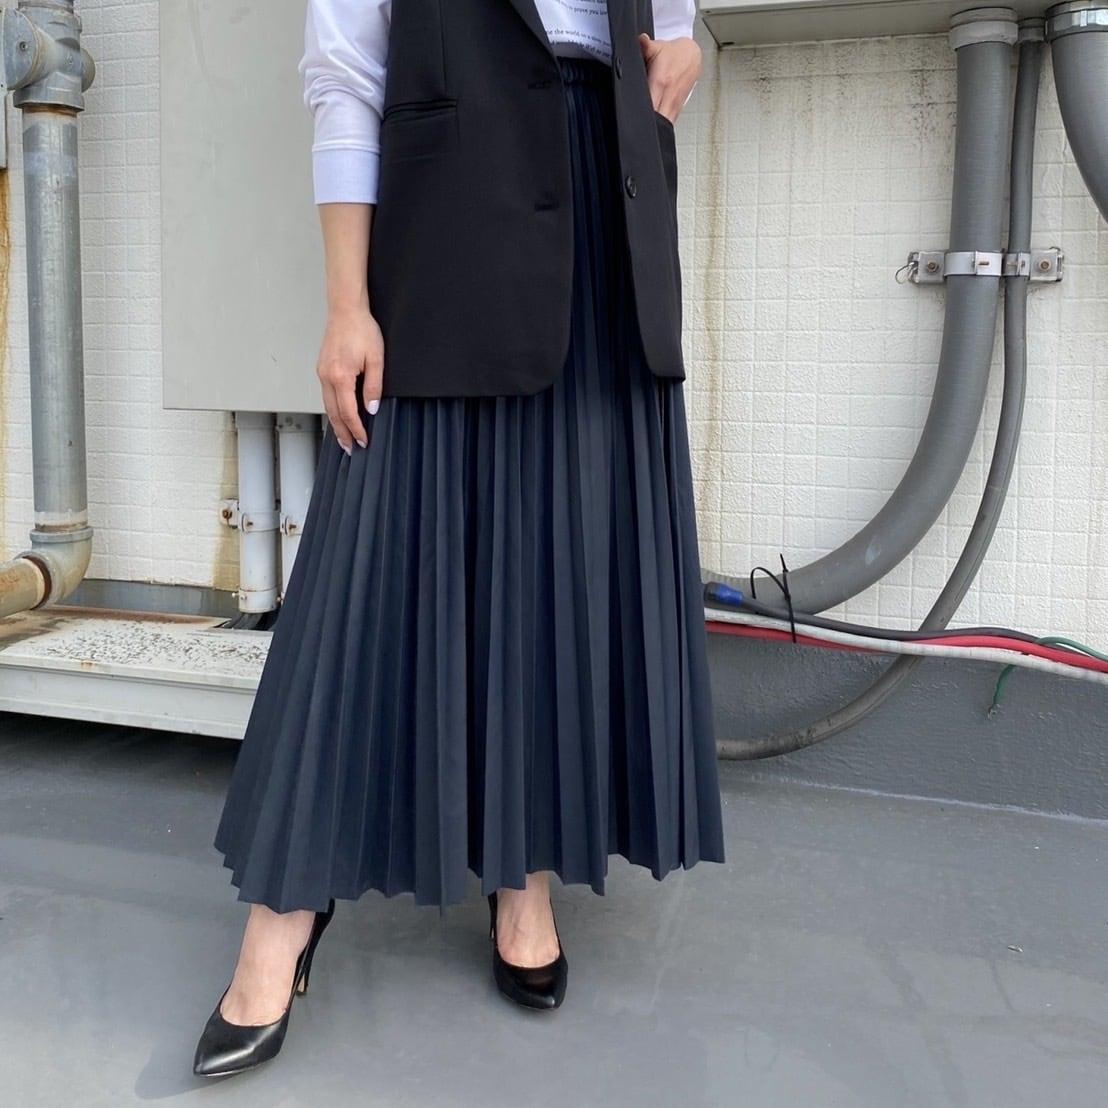 【 ROSIEE 】- R253210 - レザープリーツスカート